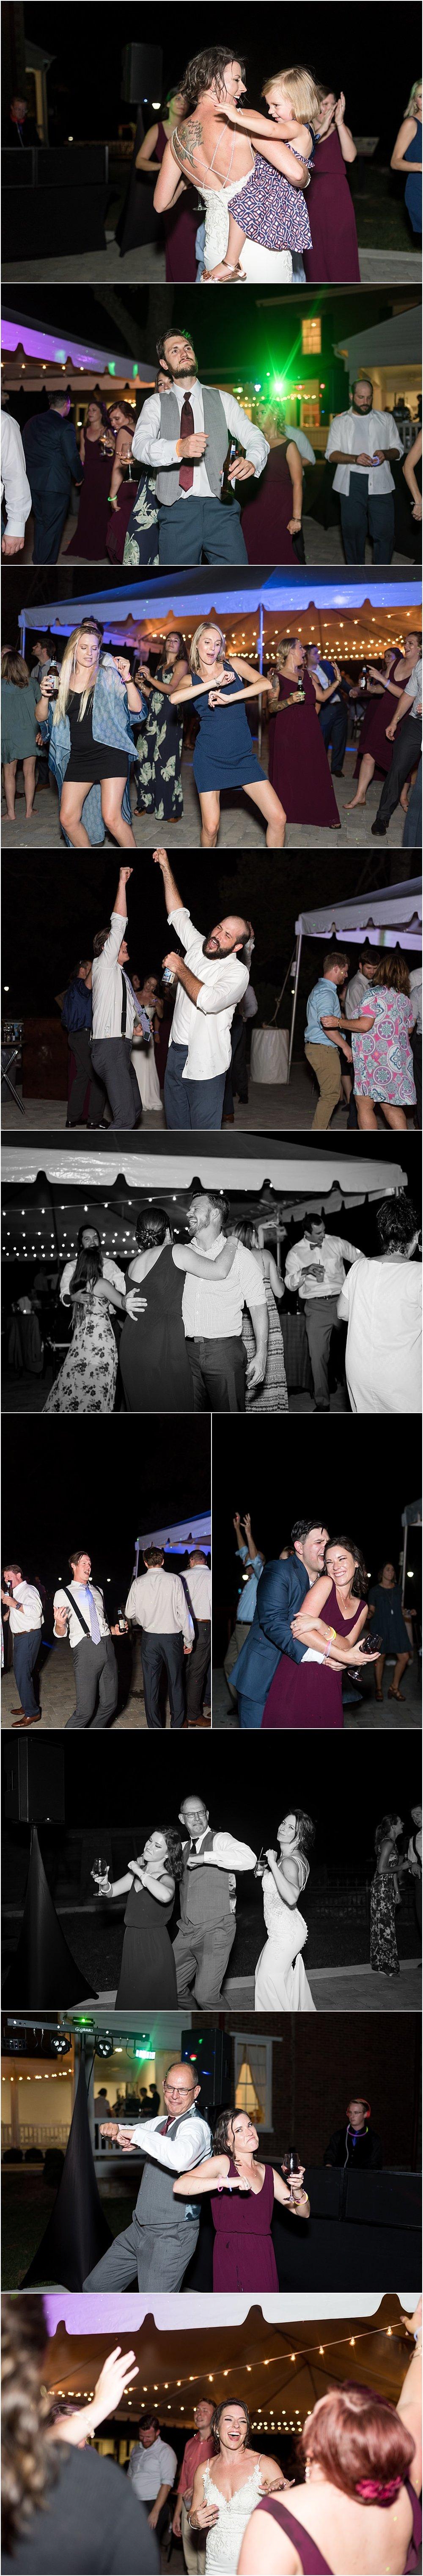 Jordan-and-Anna-Ravenswood-Mansion-Wedding-in-Brentwood-TN-Nashville-Wedding-Photographers+12